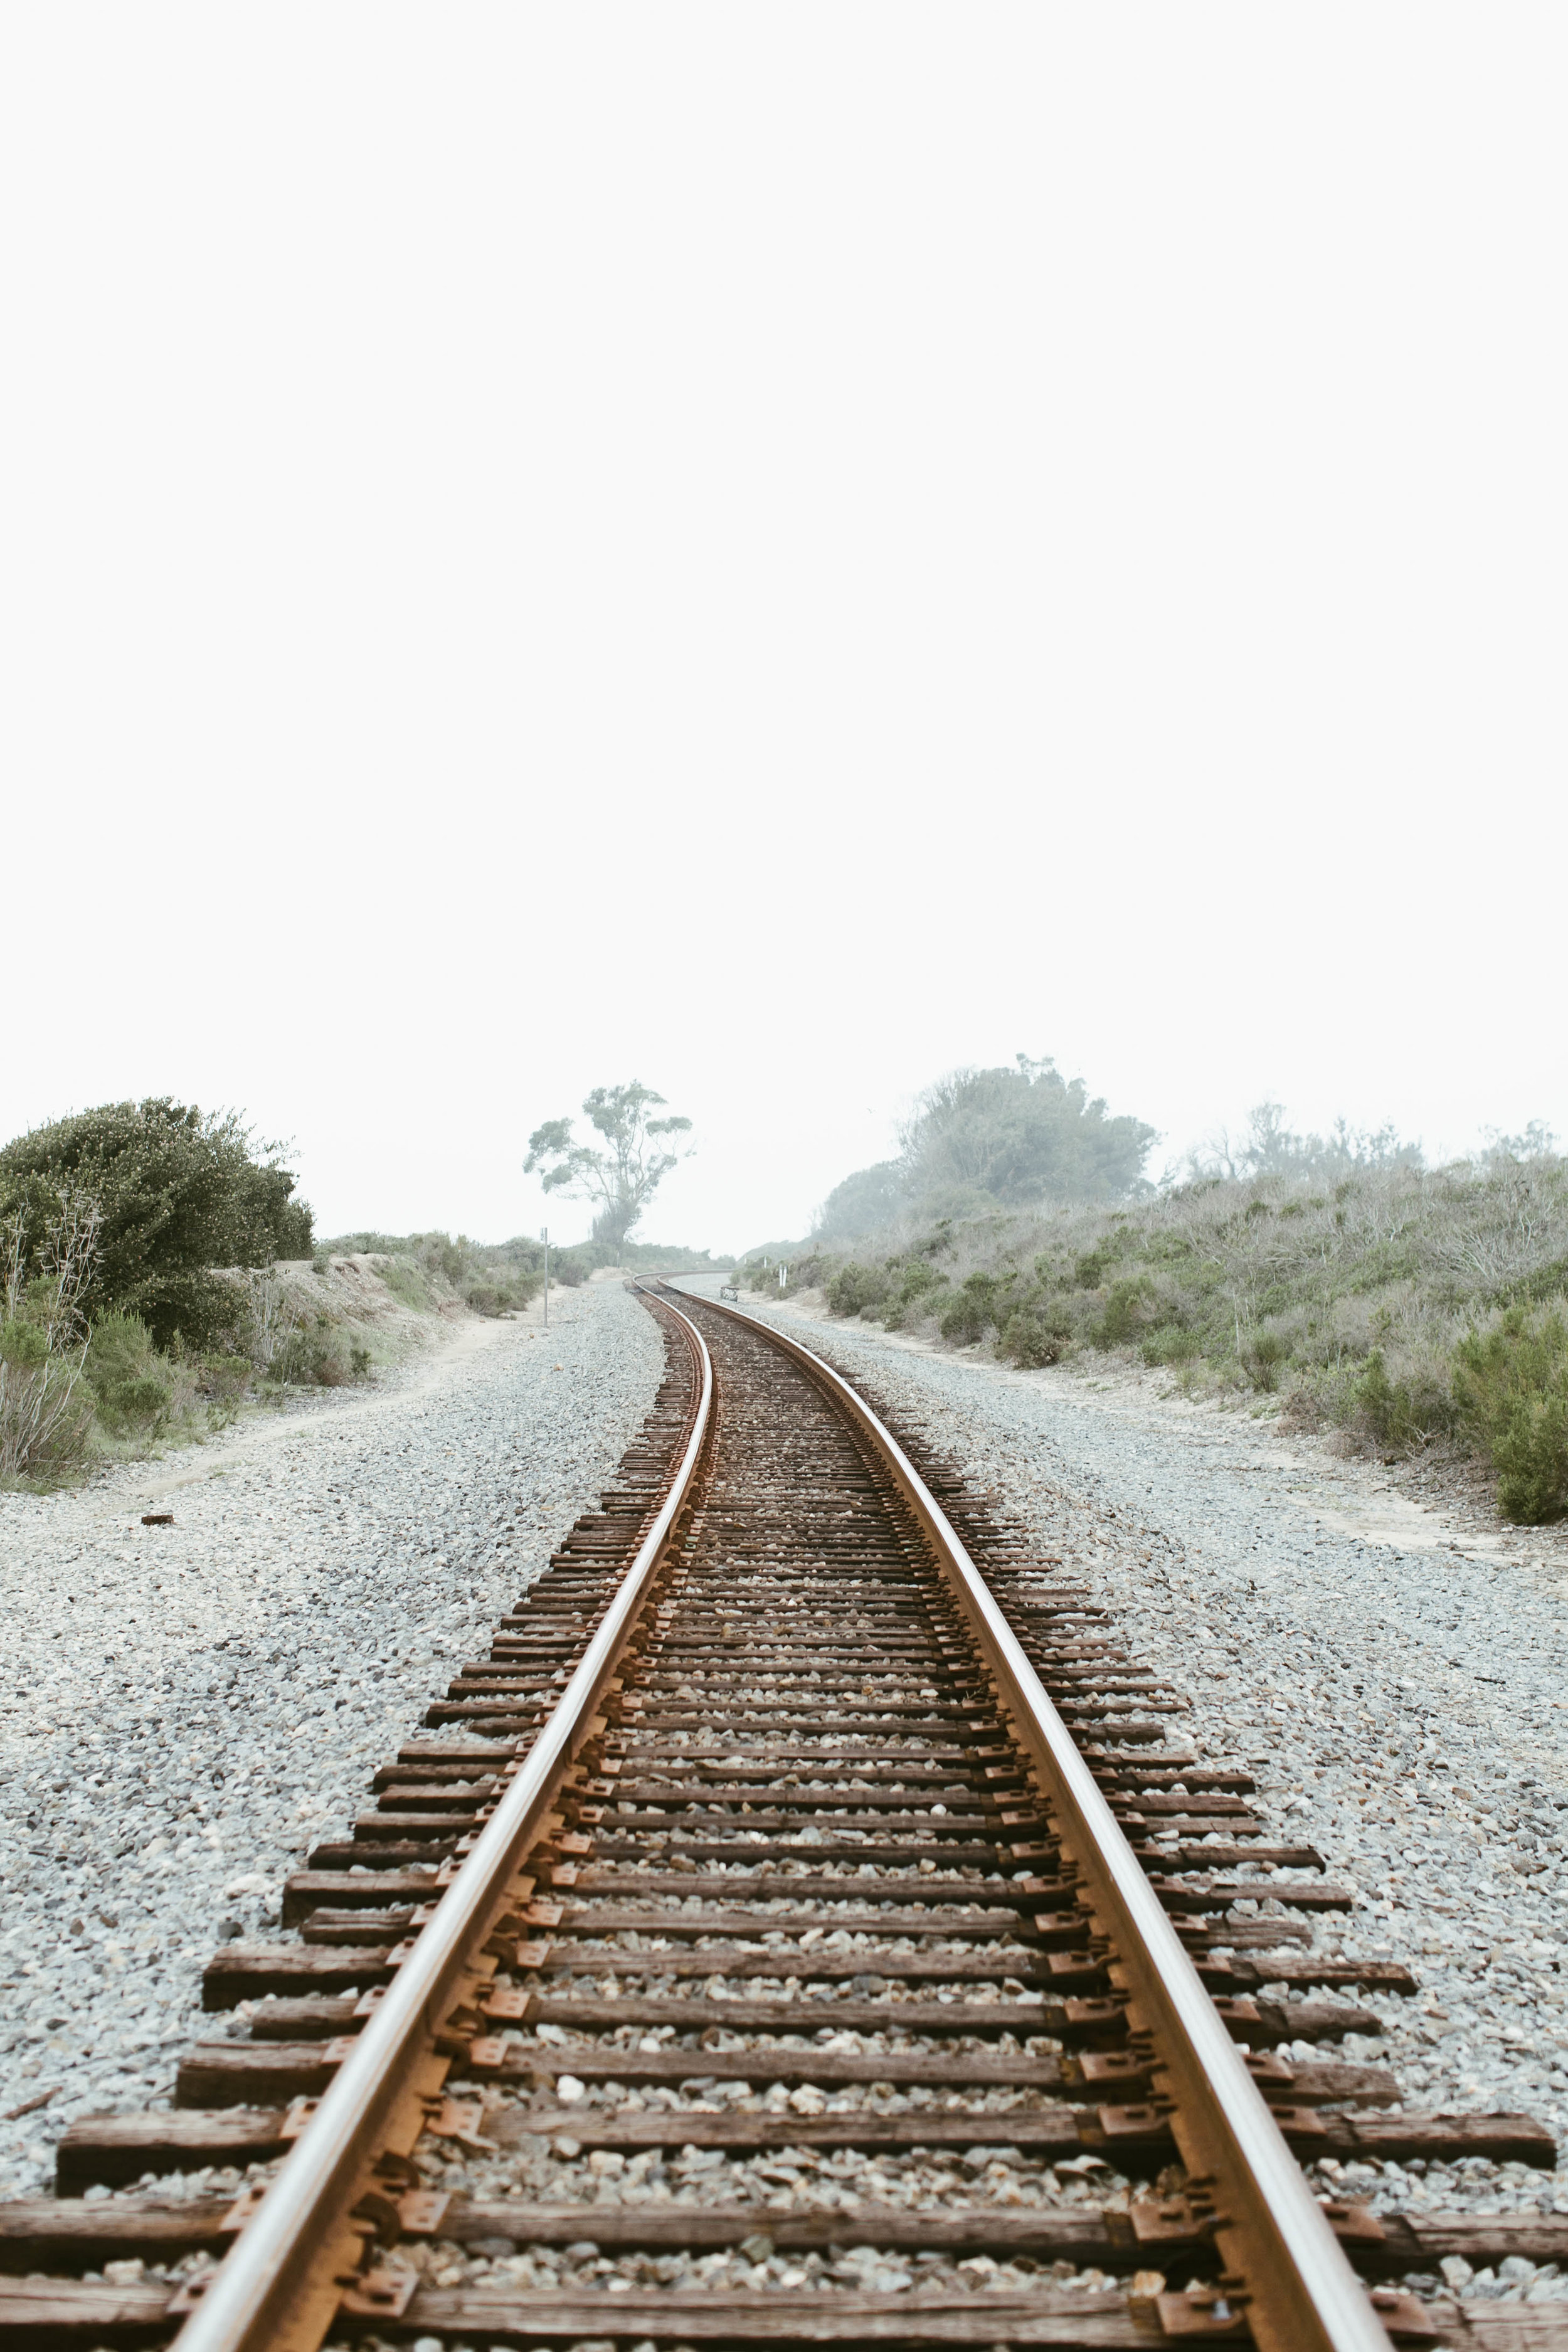 jennahazelphotography-updated-portfolio-4355.jpg